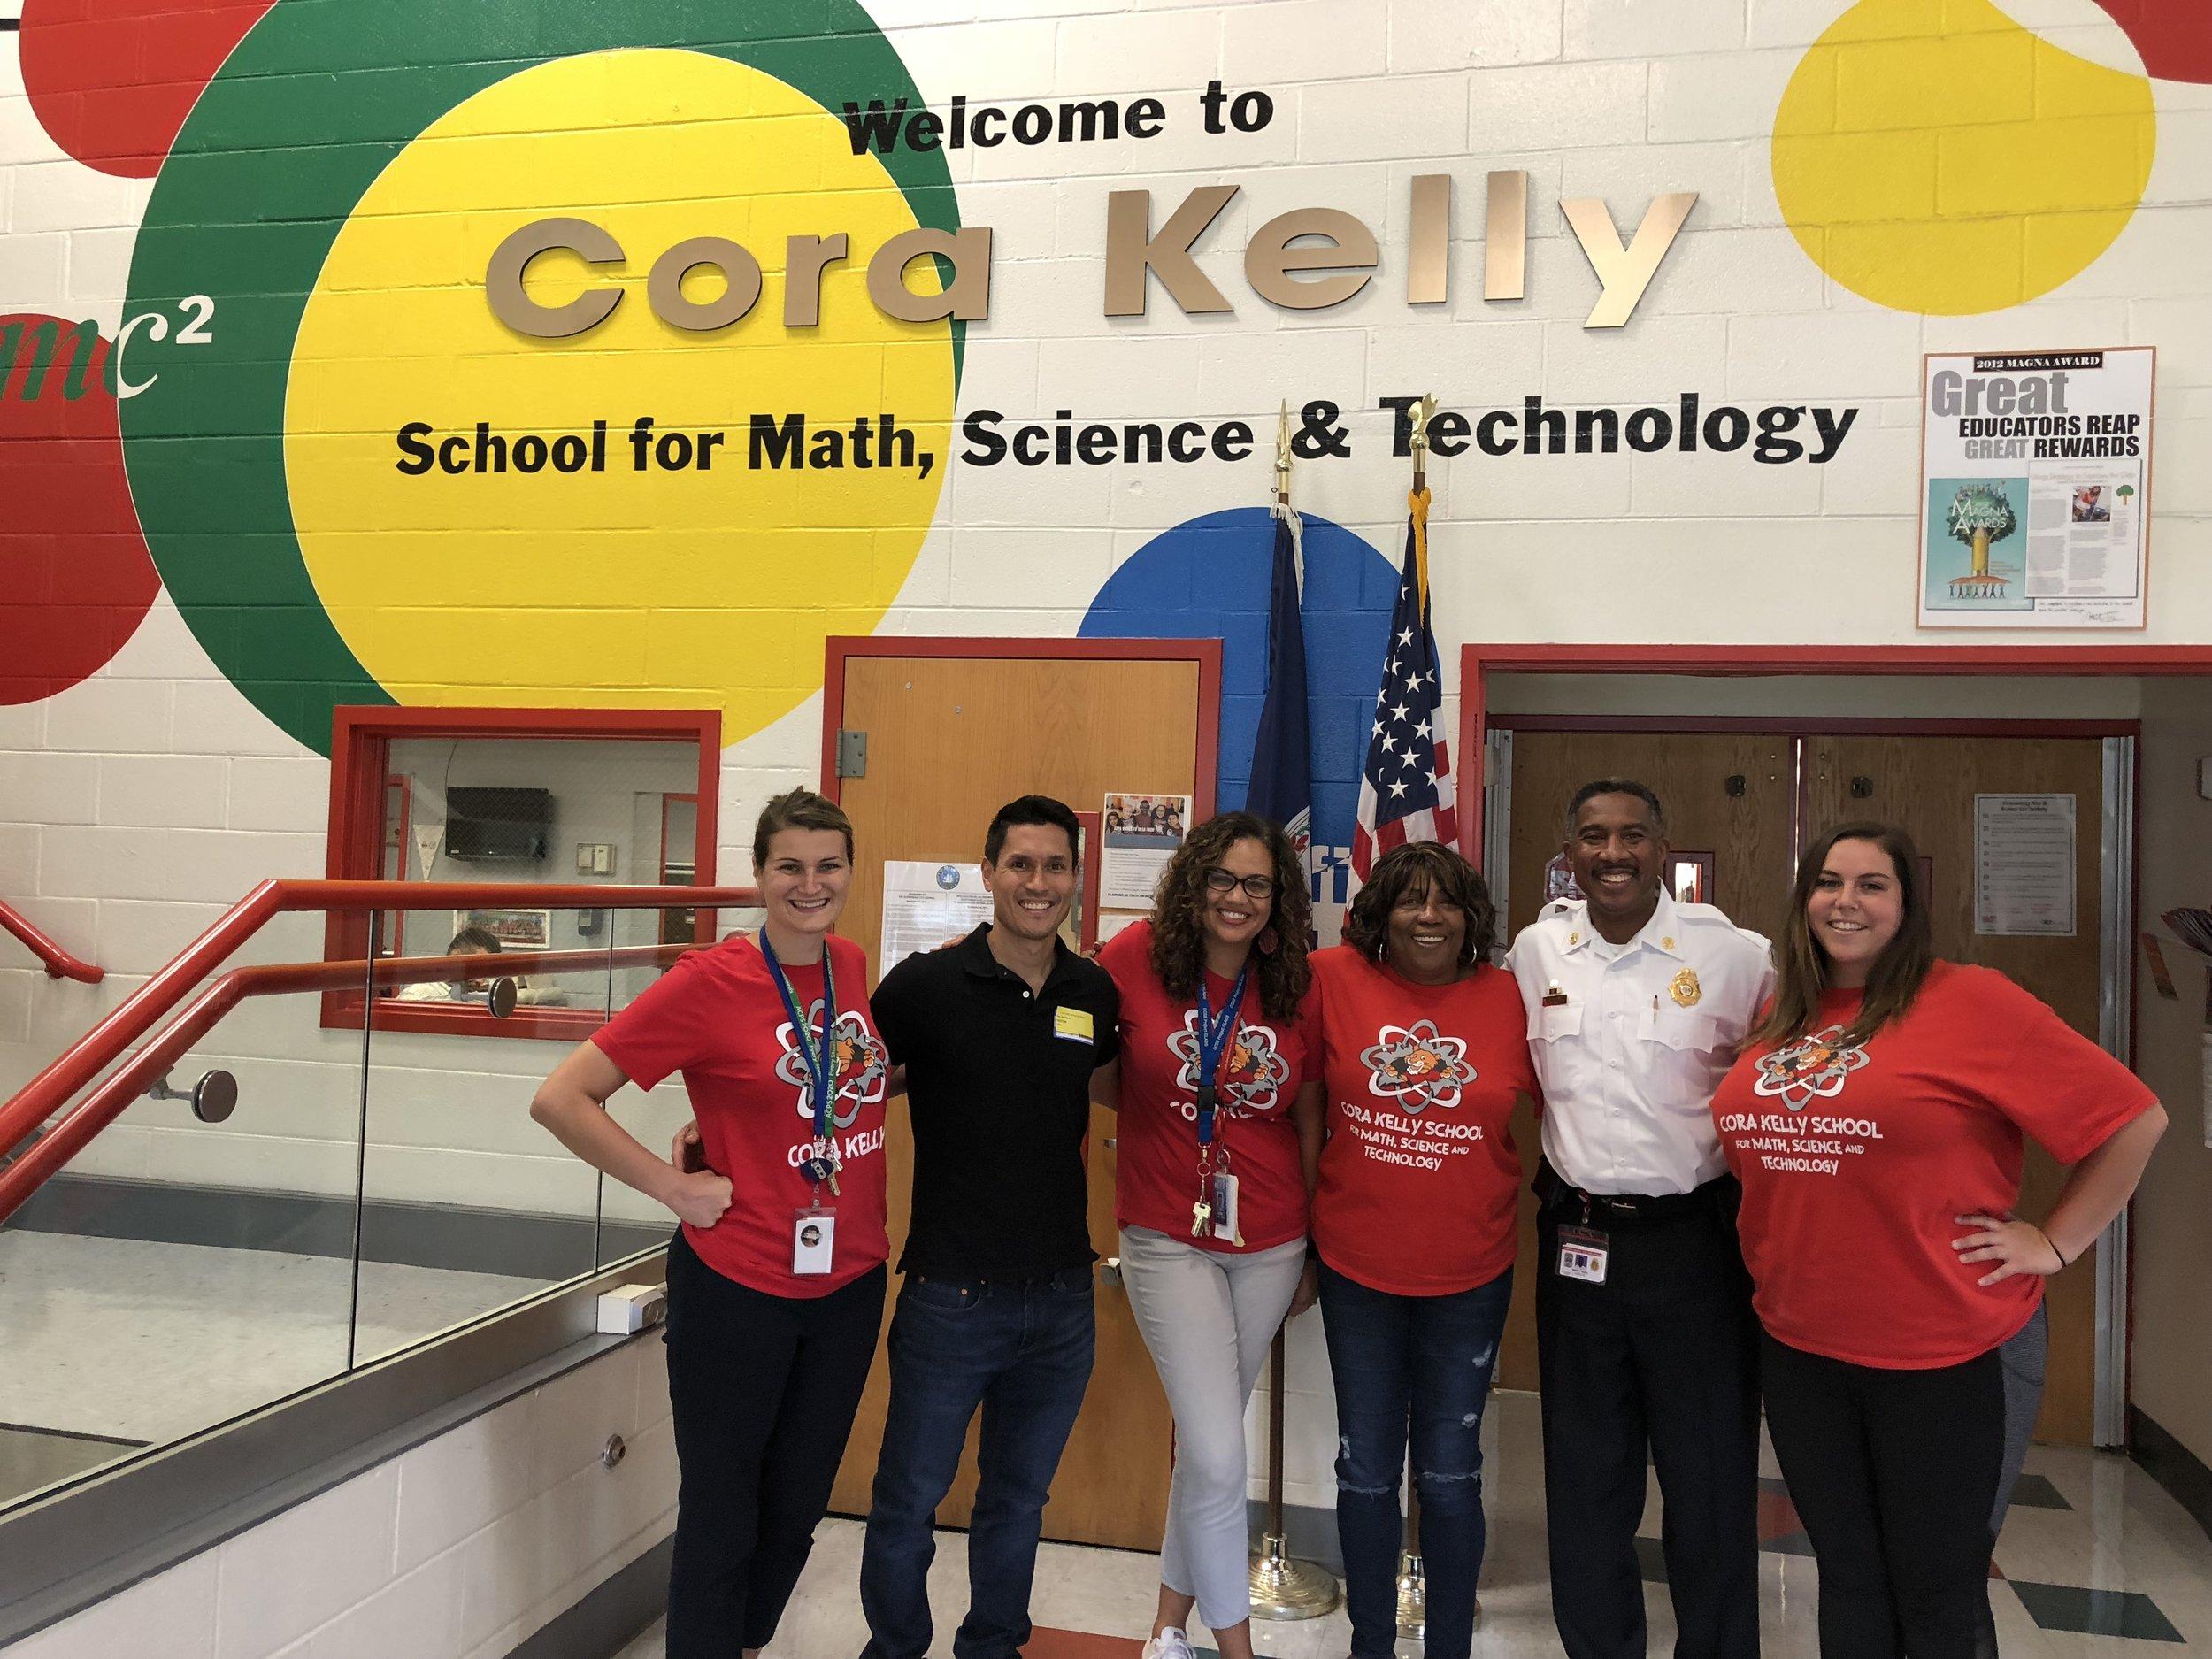 (Left to Right) Mrs. Holthaus (Assistant Principal), Ken Savittiere (K12AF & FCFRD), Mrs. Crews-West (Principal), Mrs. Hines, Chief Willie Bailey (FCFRD & K12AF), Ms. Sandoval (PE)